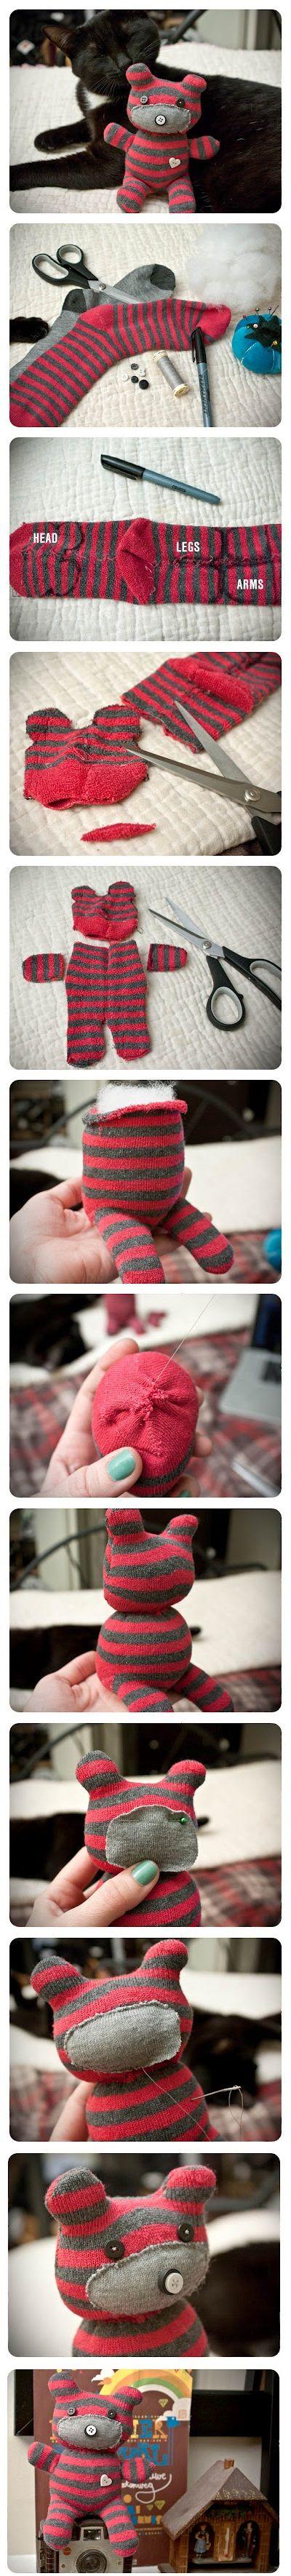 orphan sock10